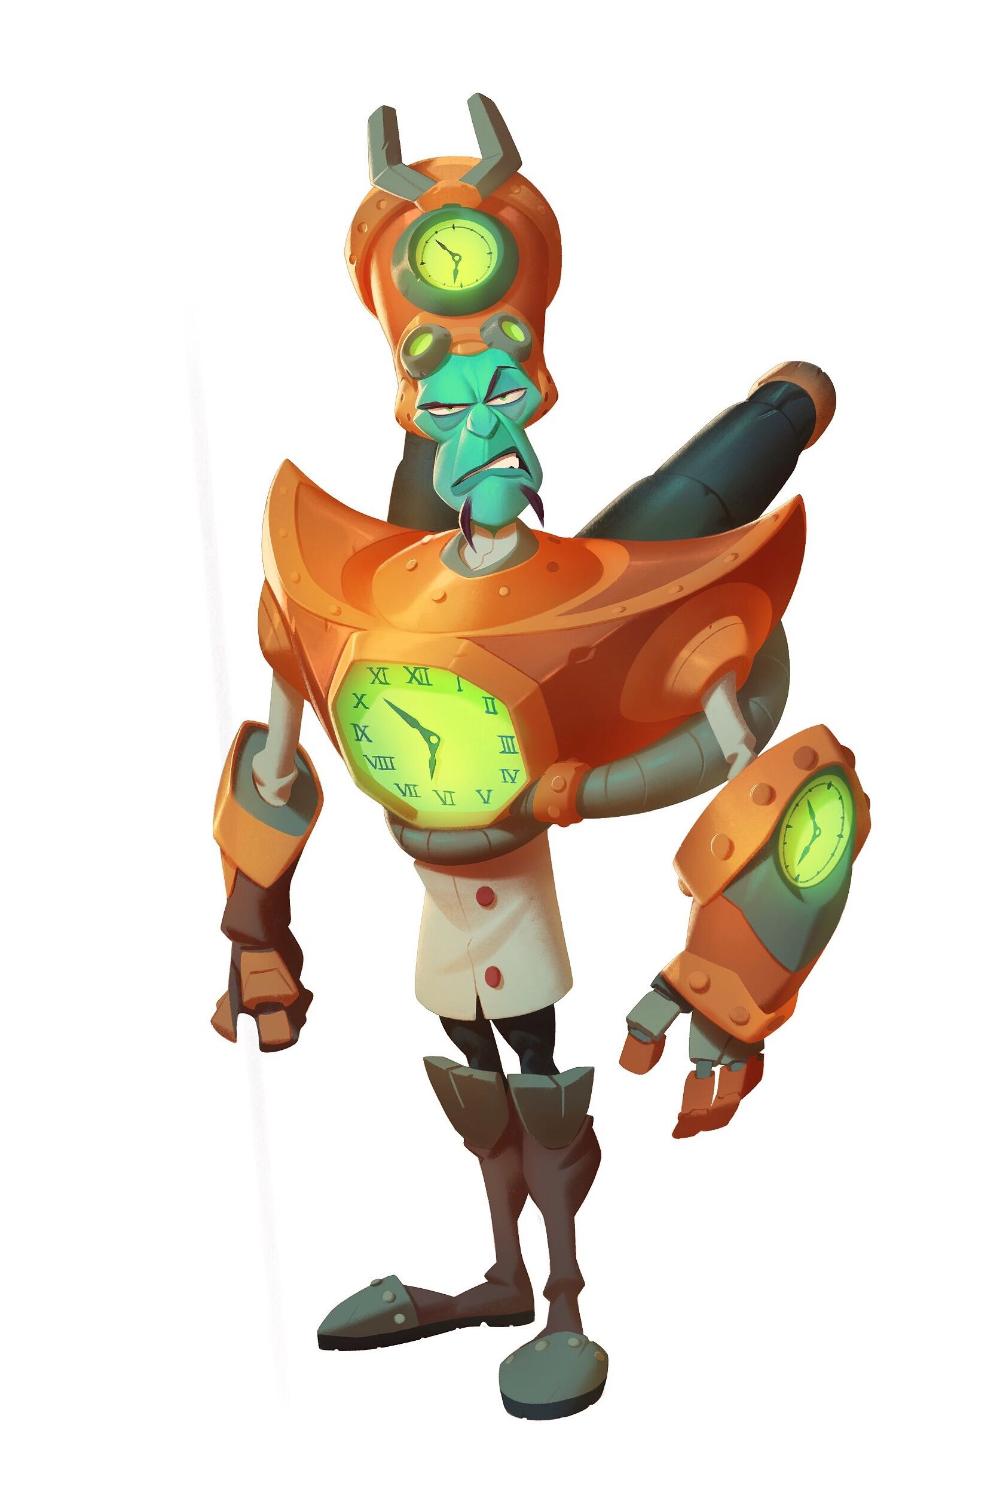 Artstation Crash Bandicoot 4 Villains First Look Nicholas Kole Crash Bandicoot Characters Crash Bandicoot Bandicoot